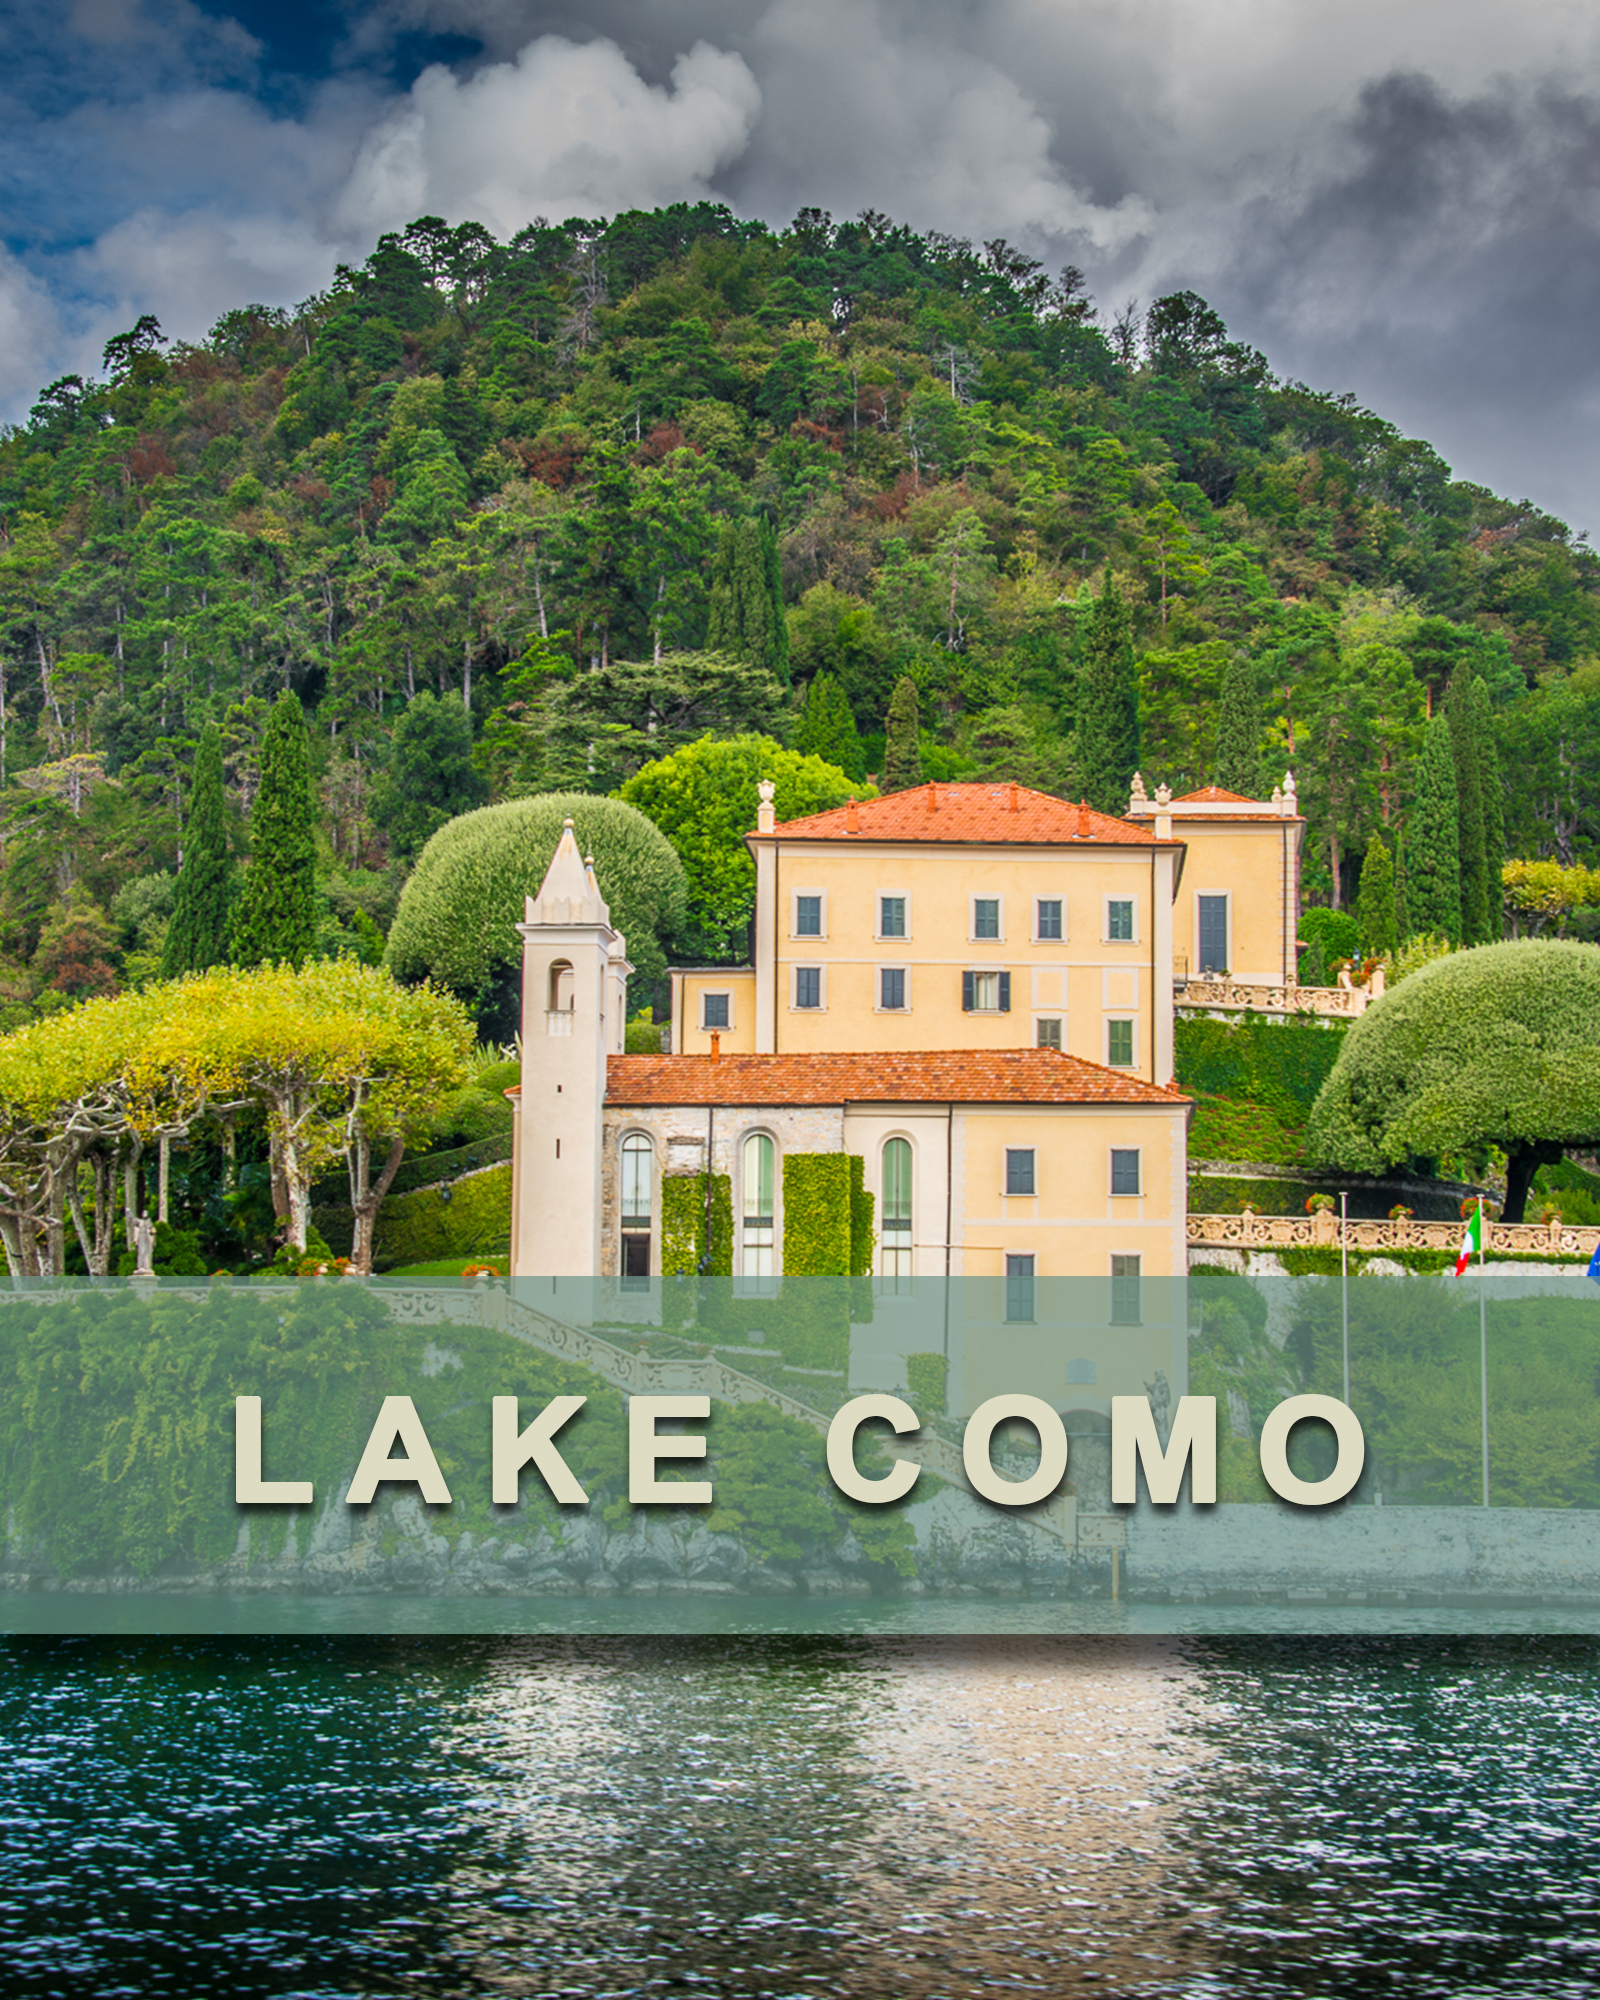 LakeComo.jpg